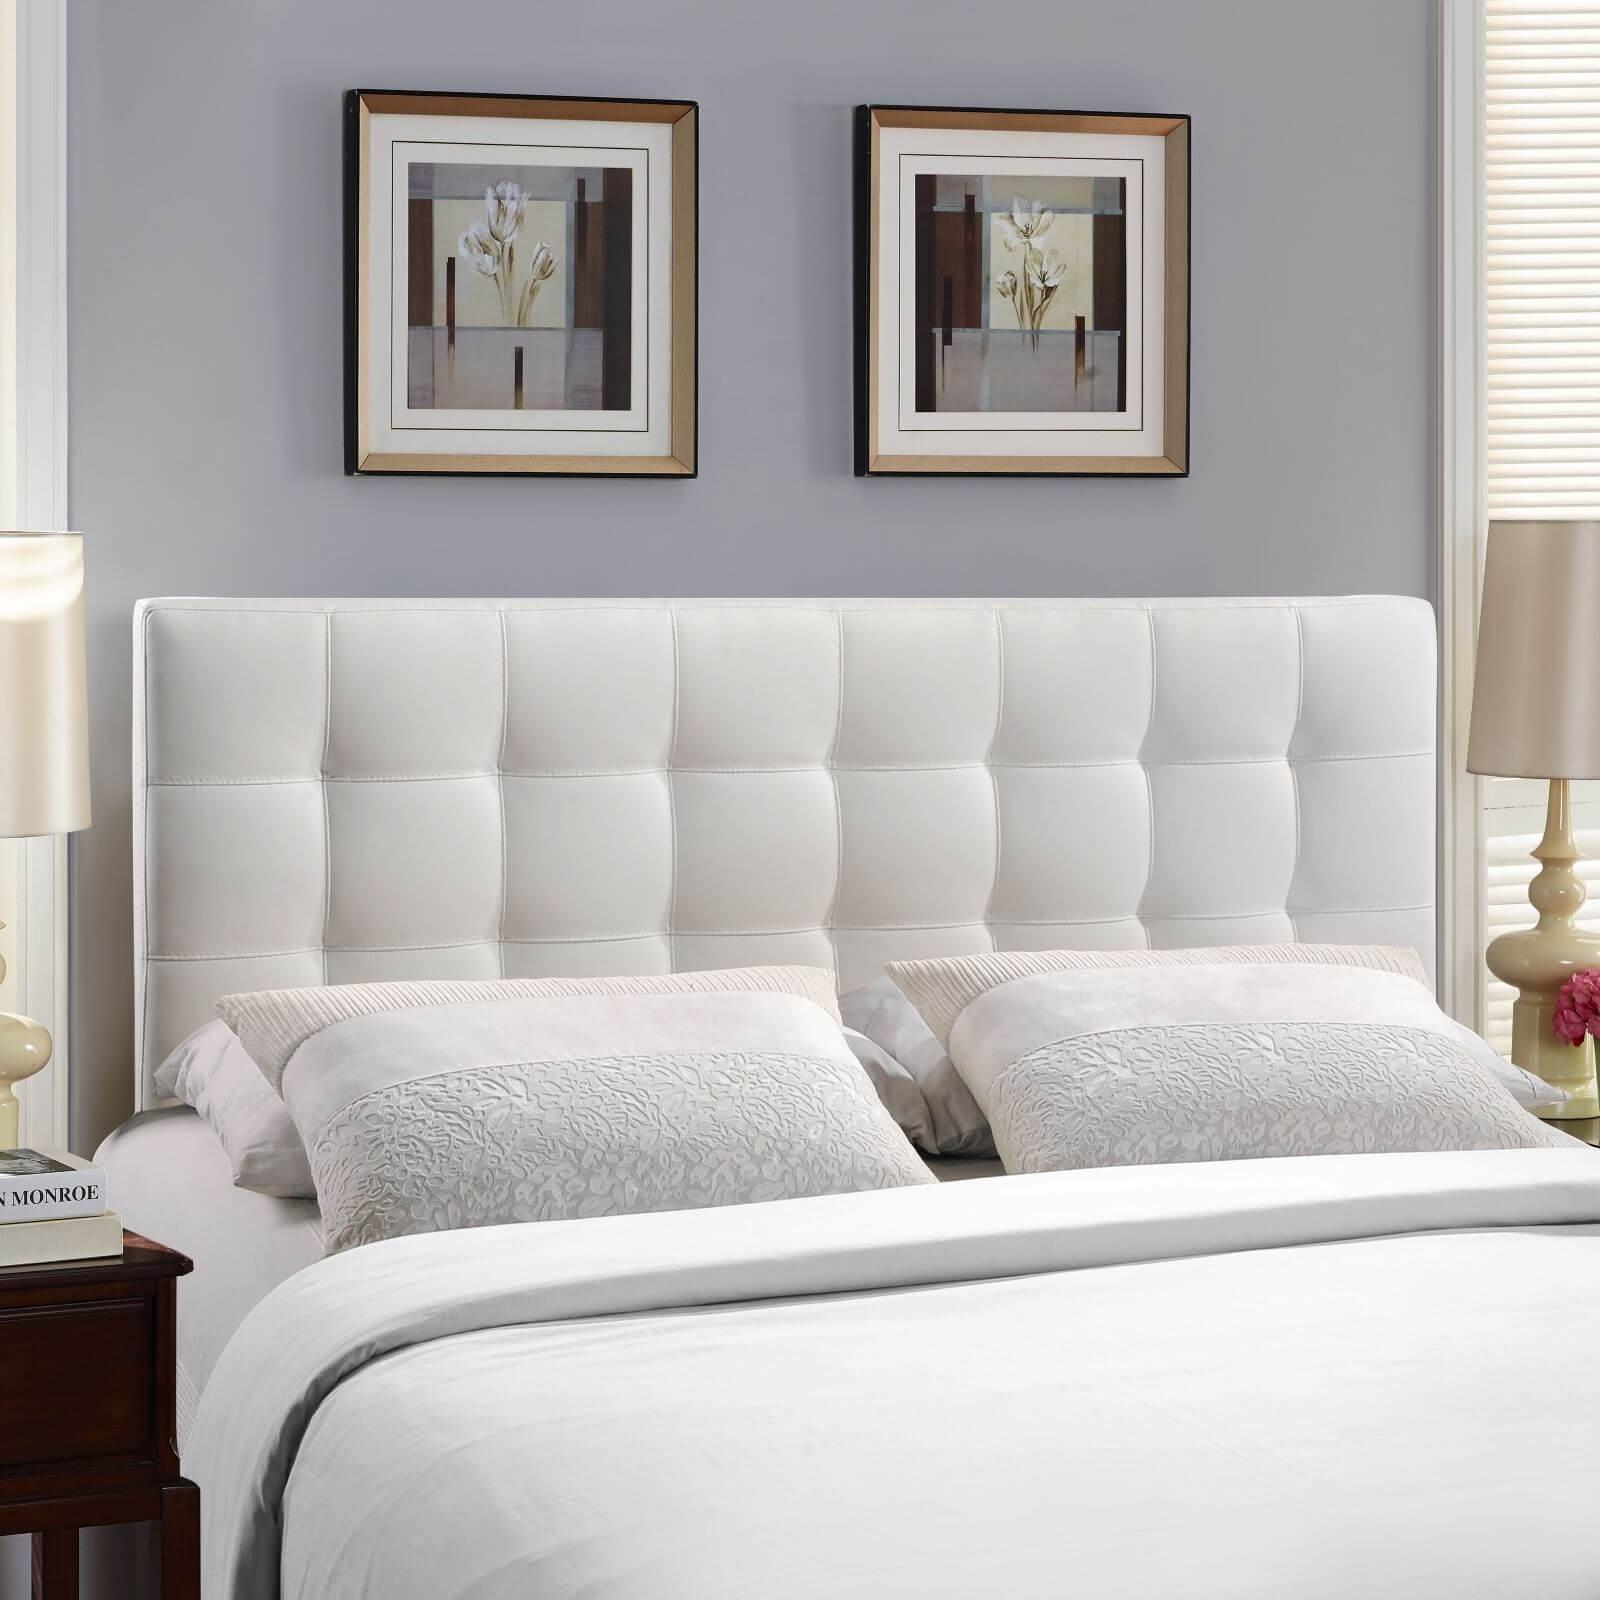 8 Chic Tufted Headboard Design Ideas For Modern Bedroom Interior Idea